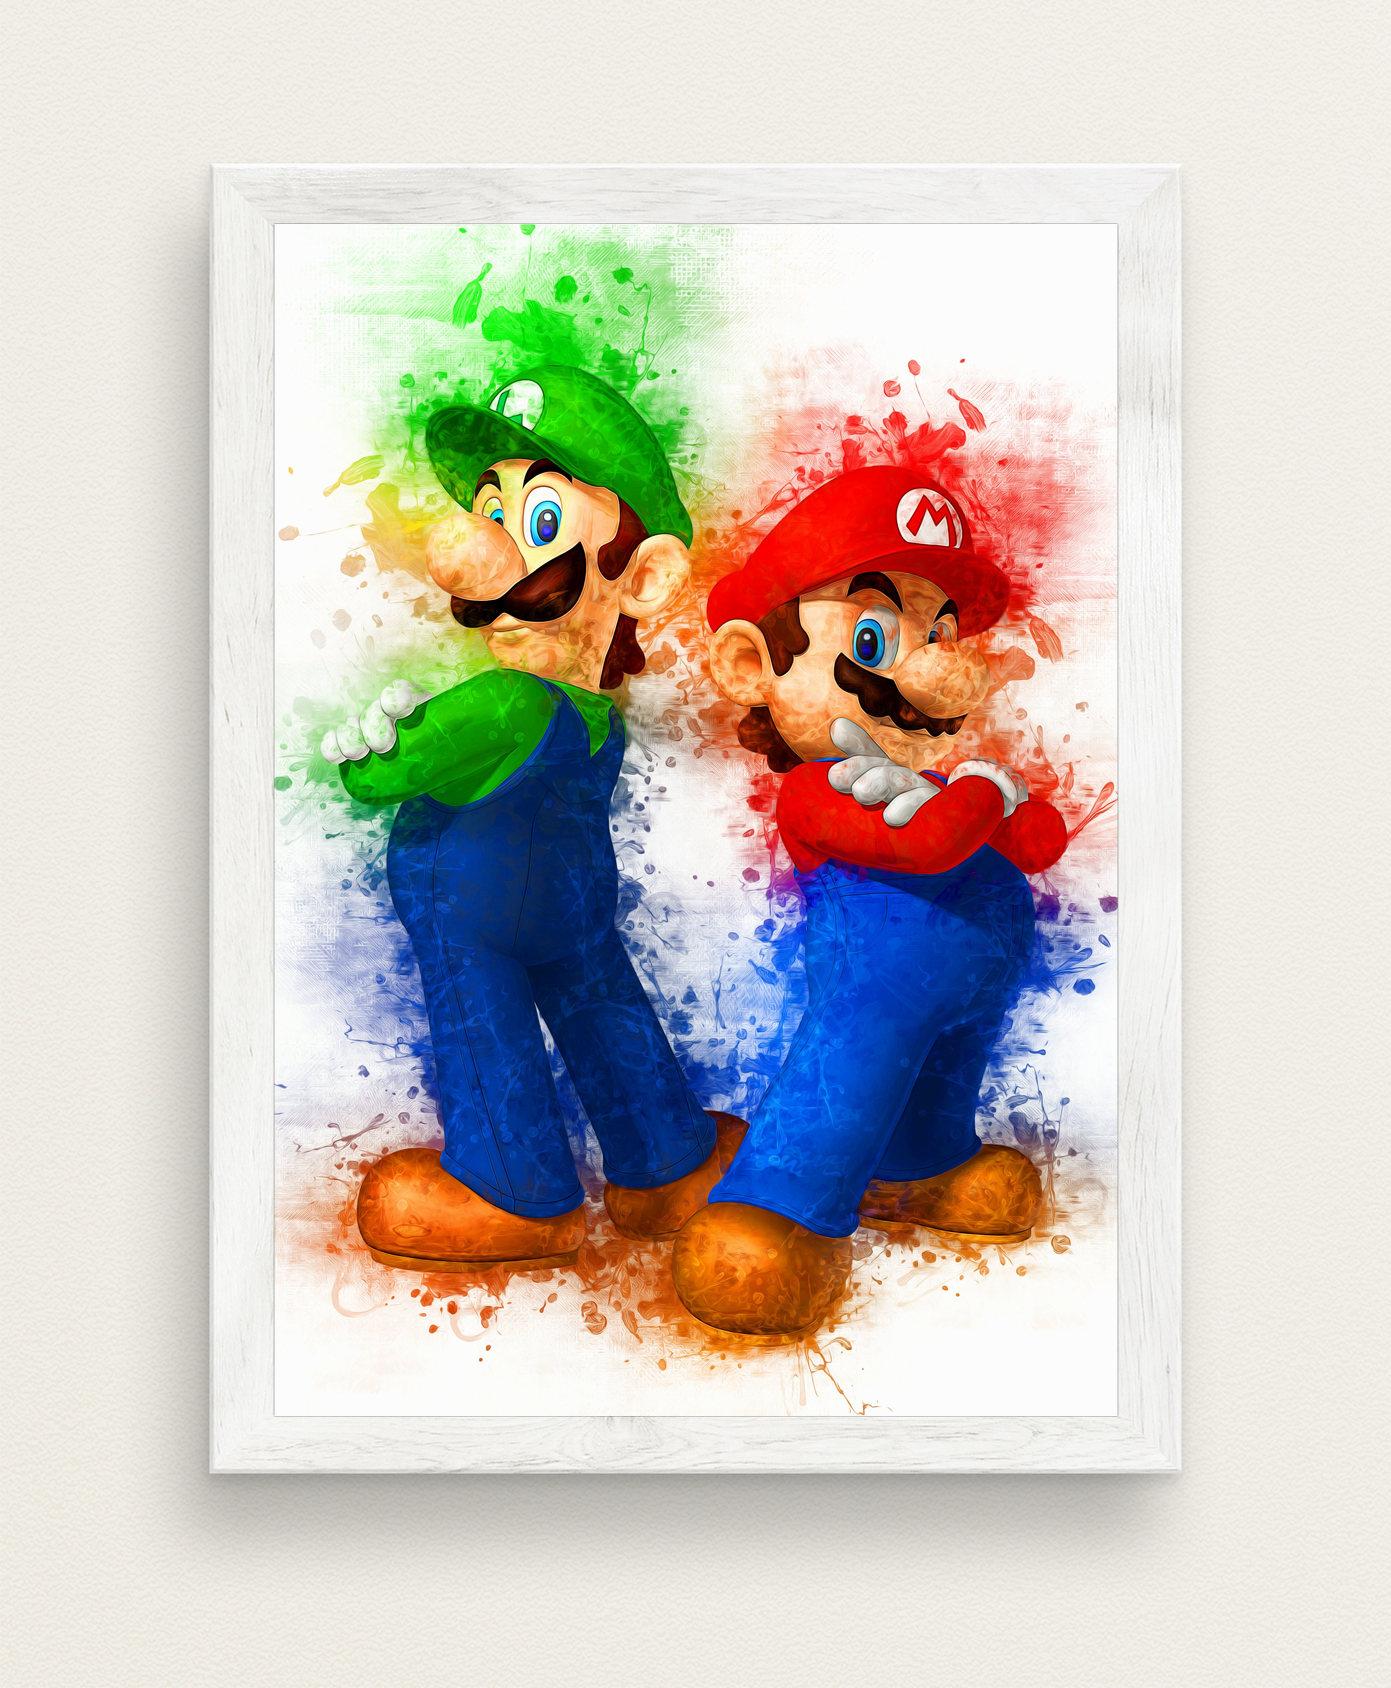 Brothers Super Mario Bros Poster Video Game Nintendo